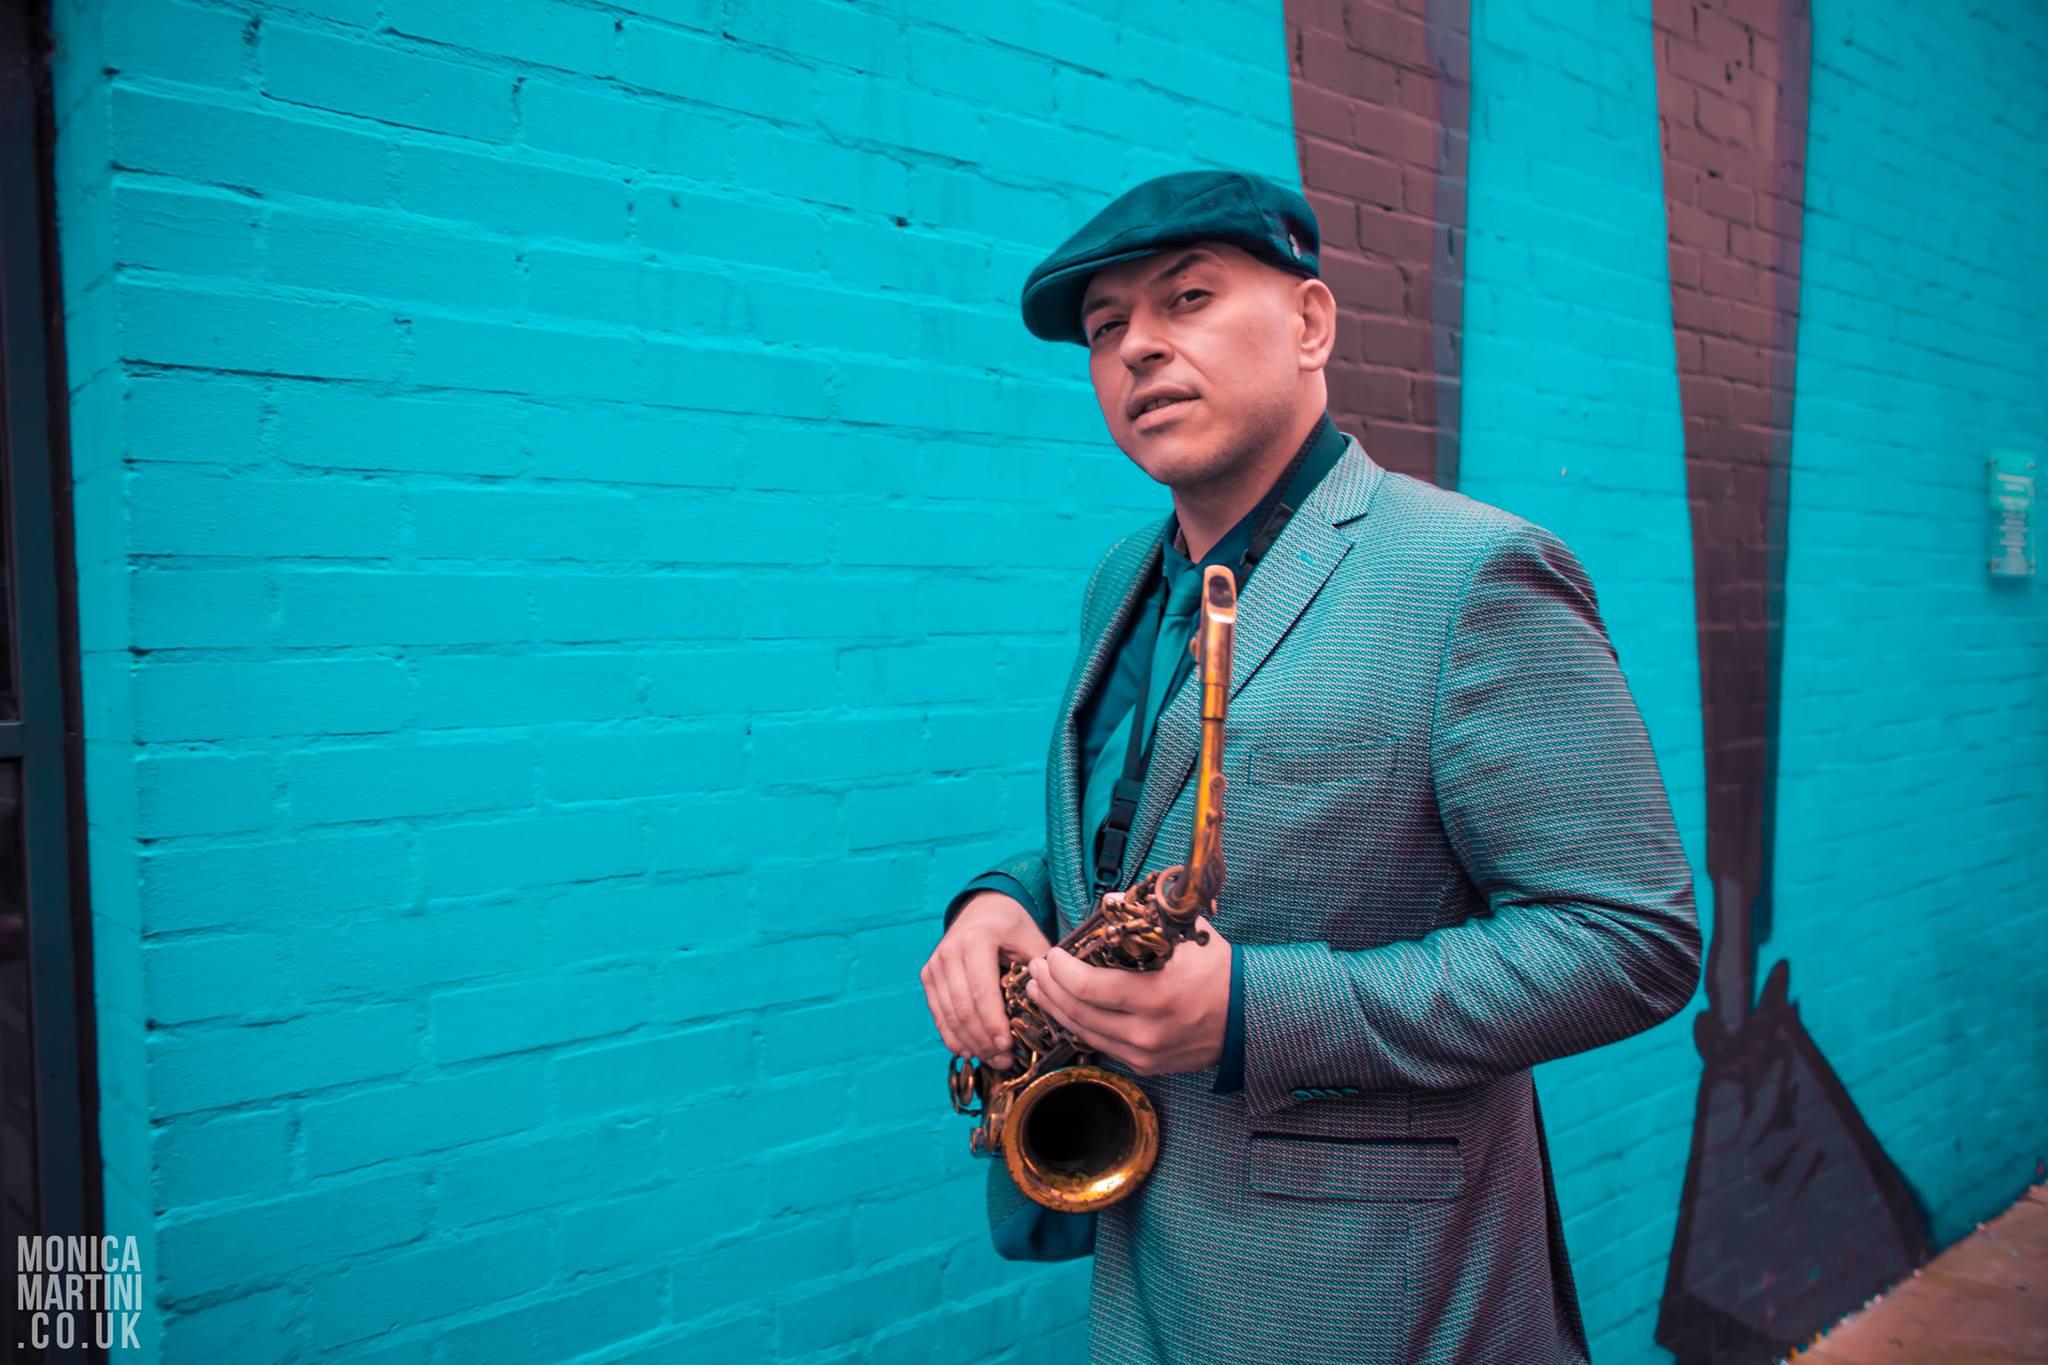 Incredible Saxophonist